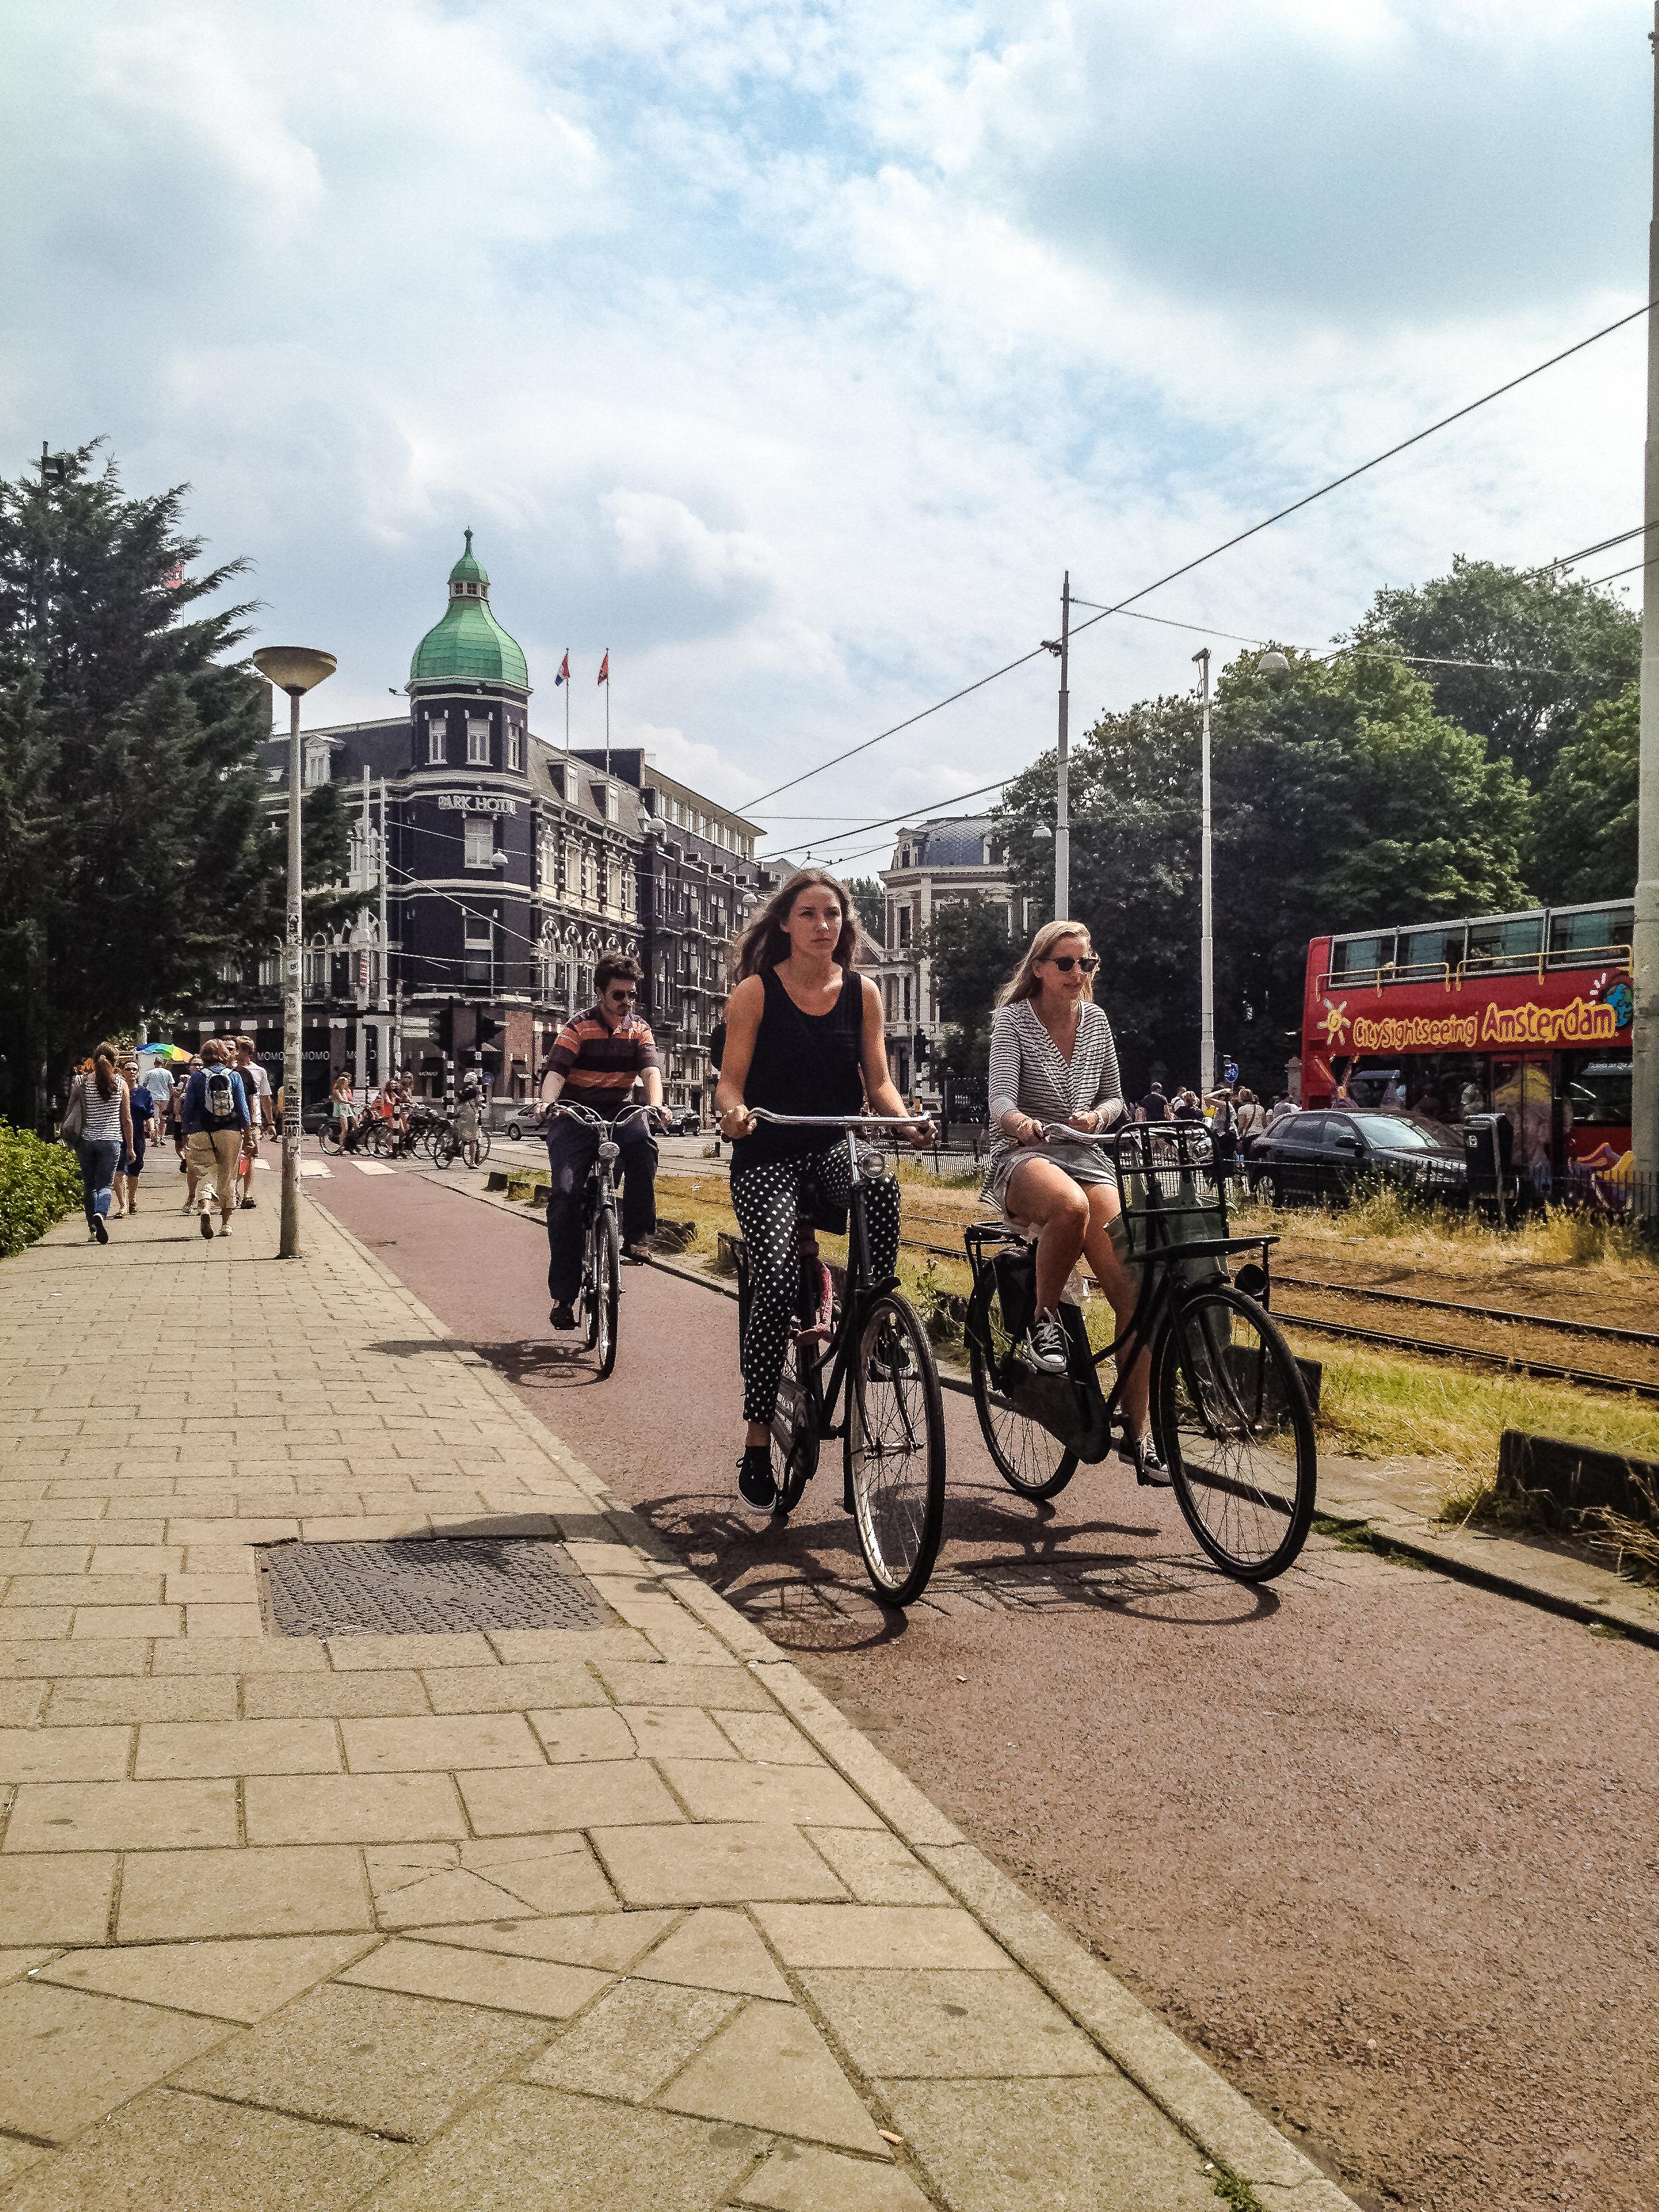 7/25/13 Amsterdam, Netherlands